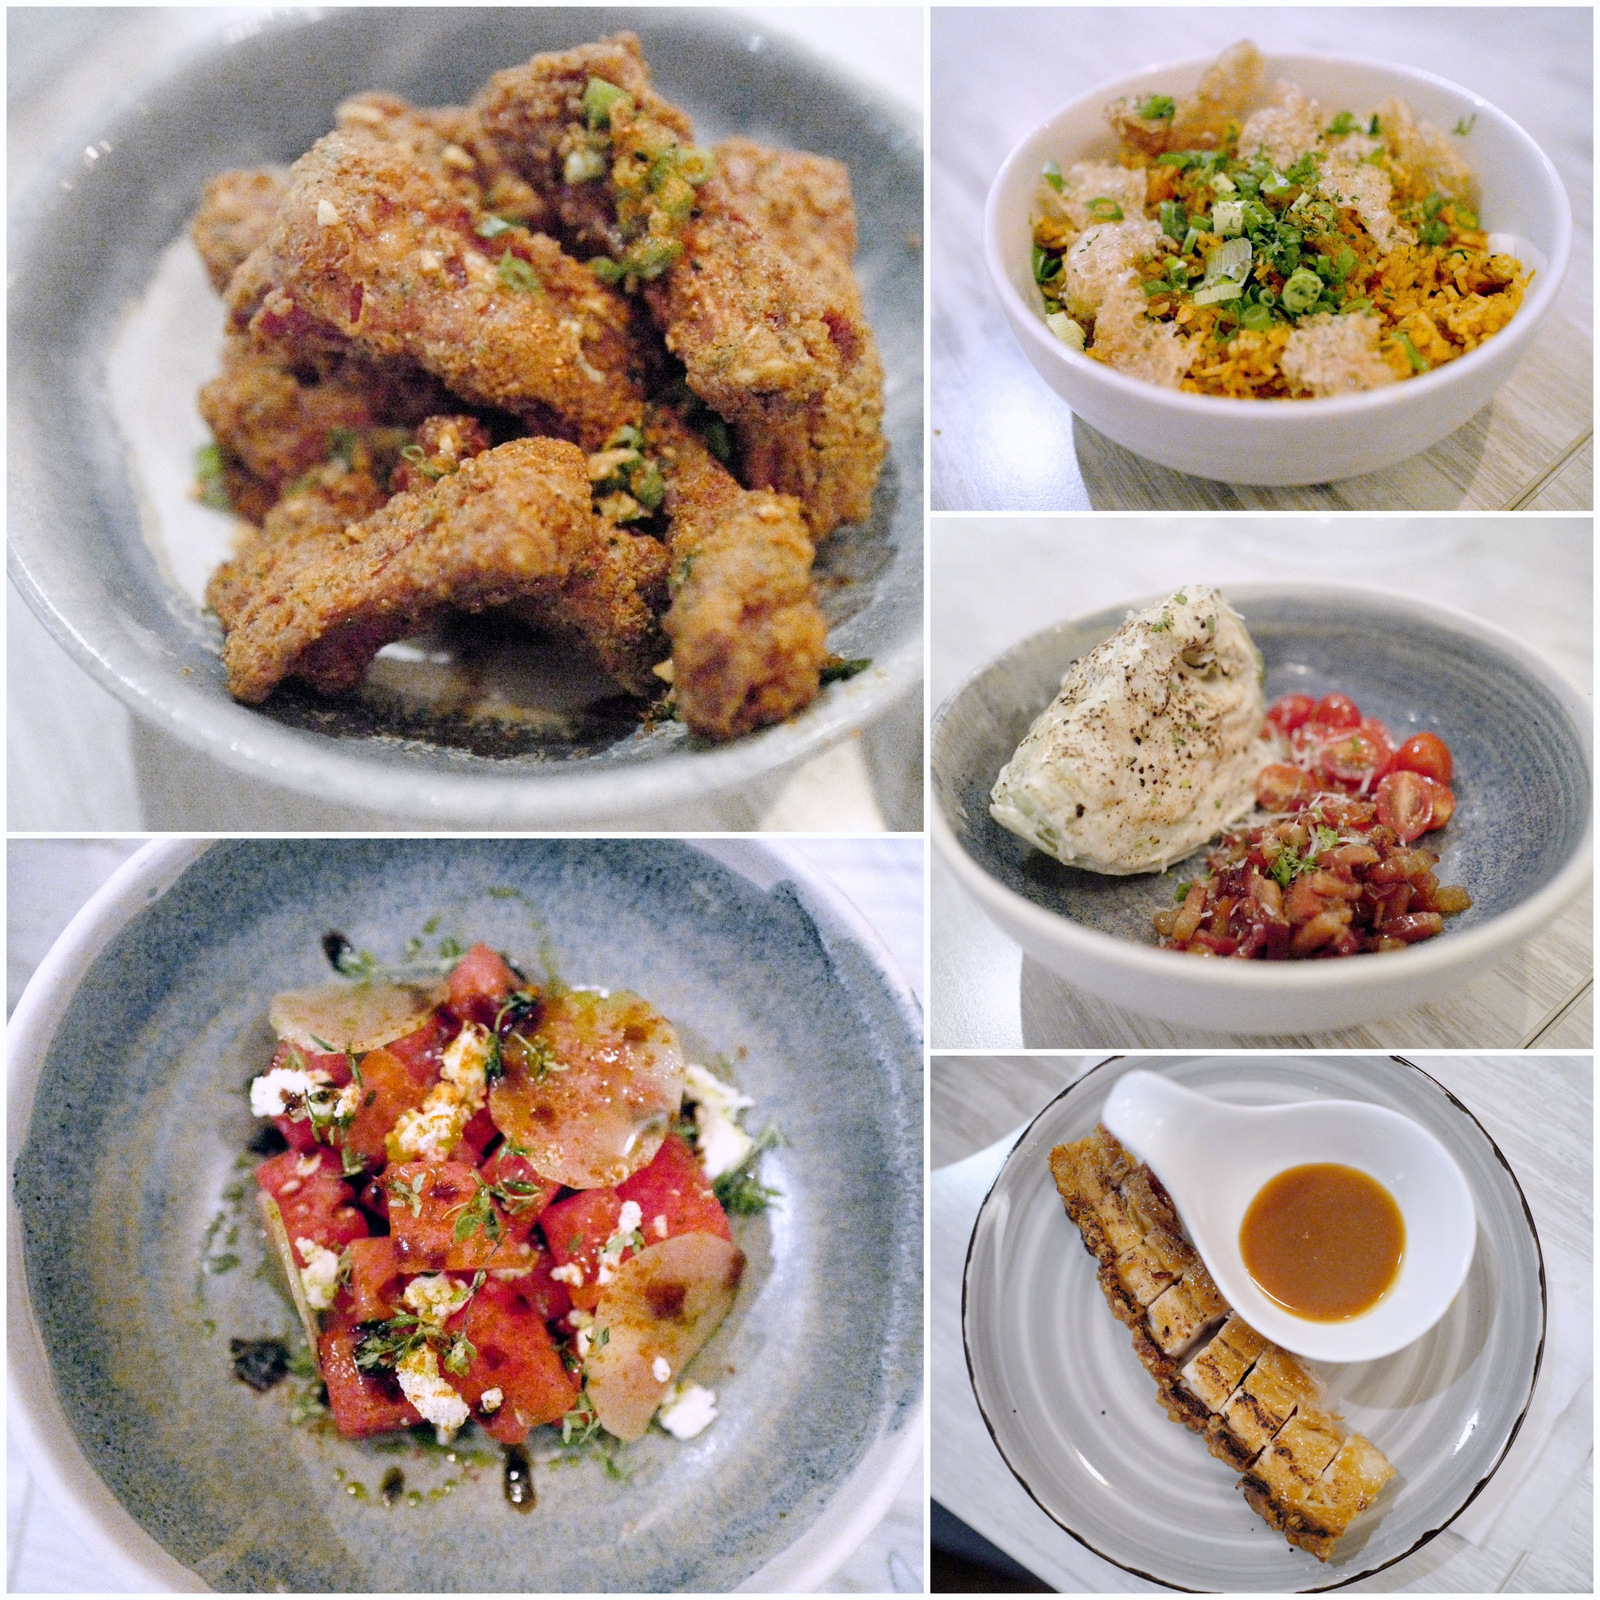 2017/18 menu: ante kitchen & bar